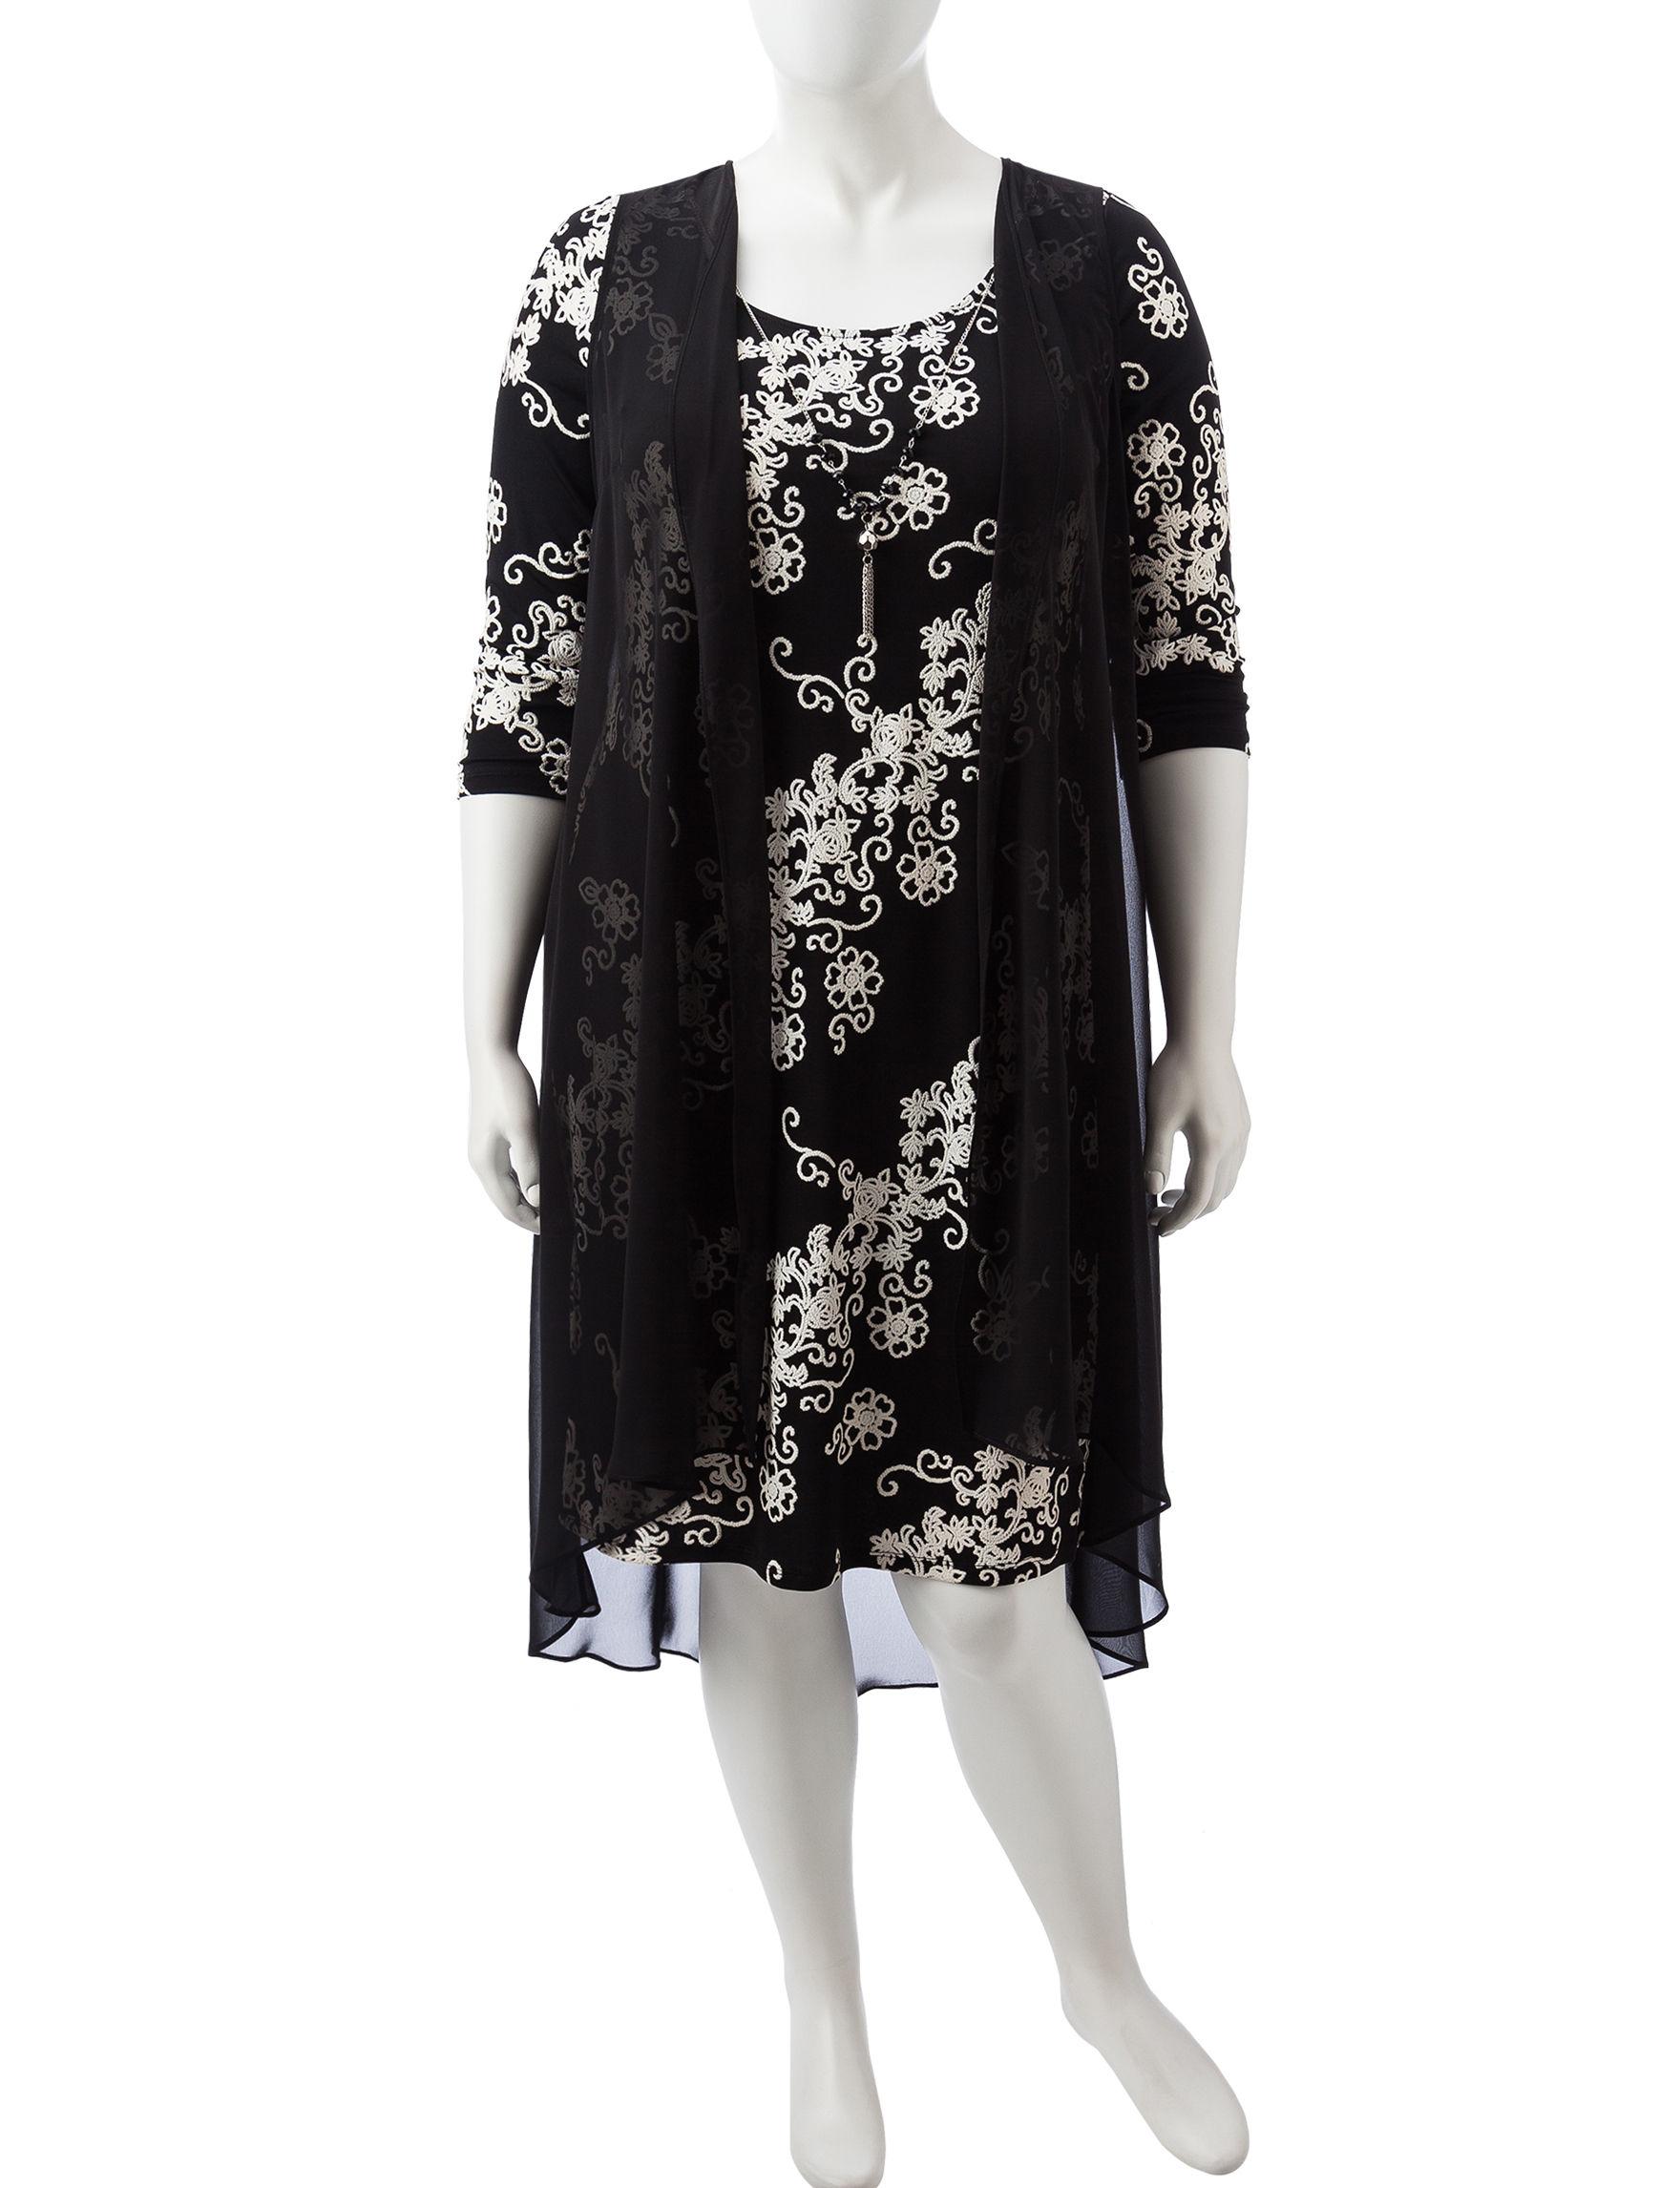 Glamour Black / White Everyday & Casual Jacket Dresses